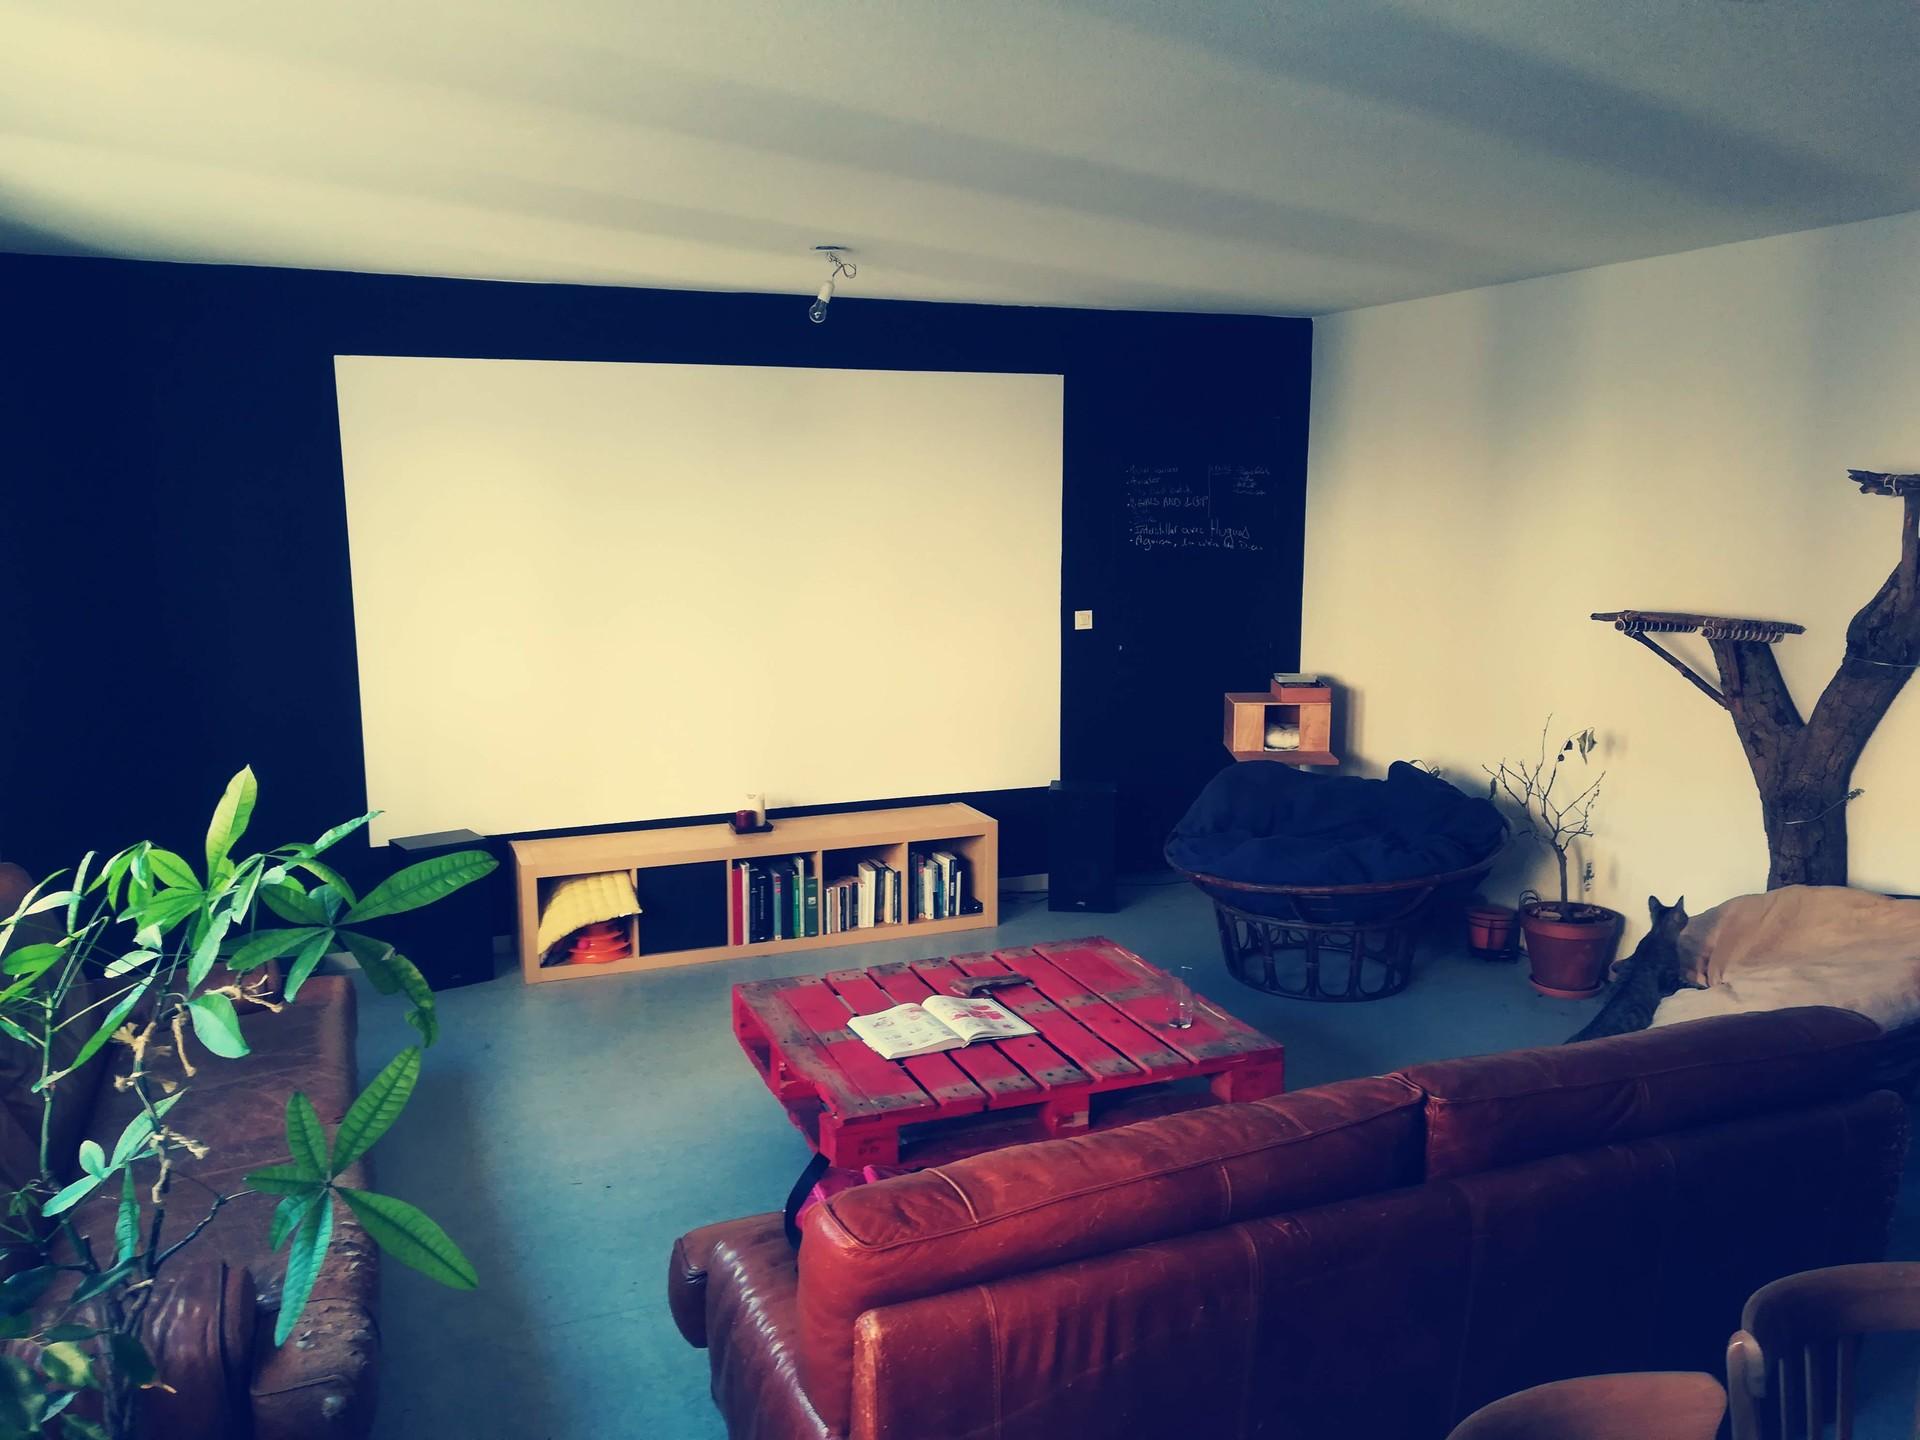 furnished-room-old-lyon-5275ebbda38a75c423219e43bddd36e4